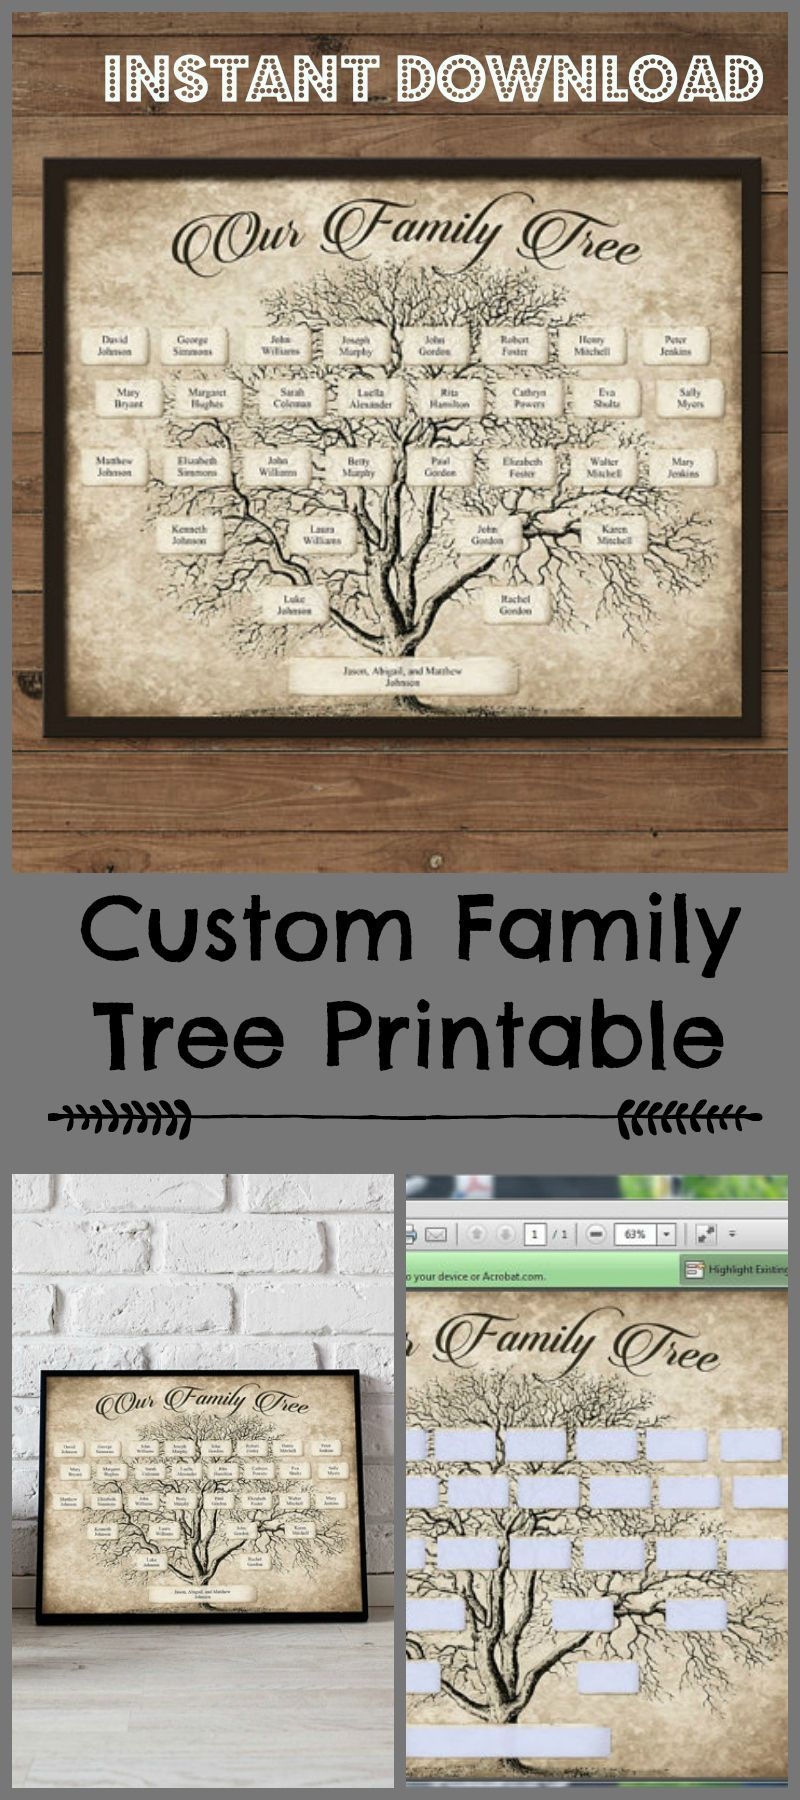 Custom Family Tree Printable 5 Generation Template ...